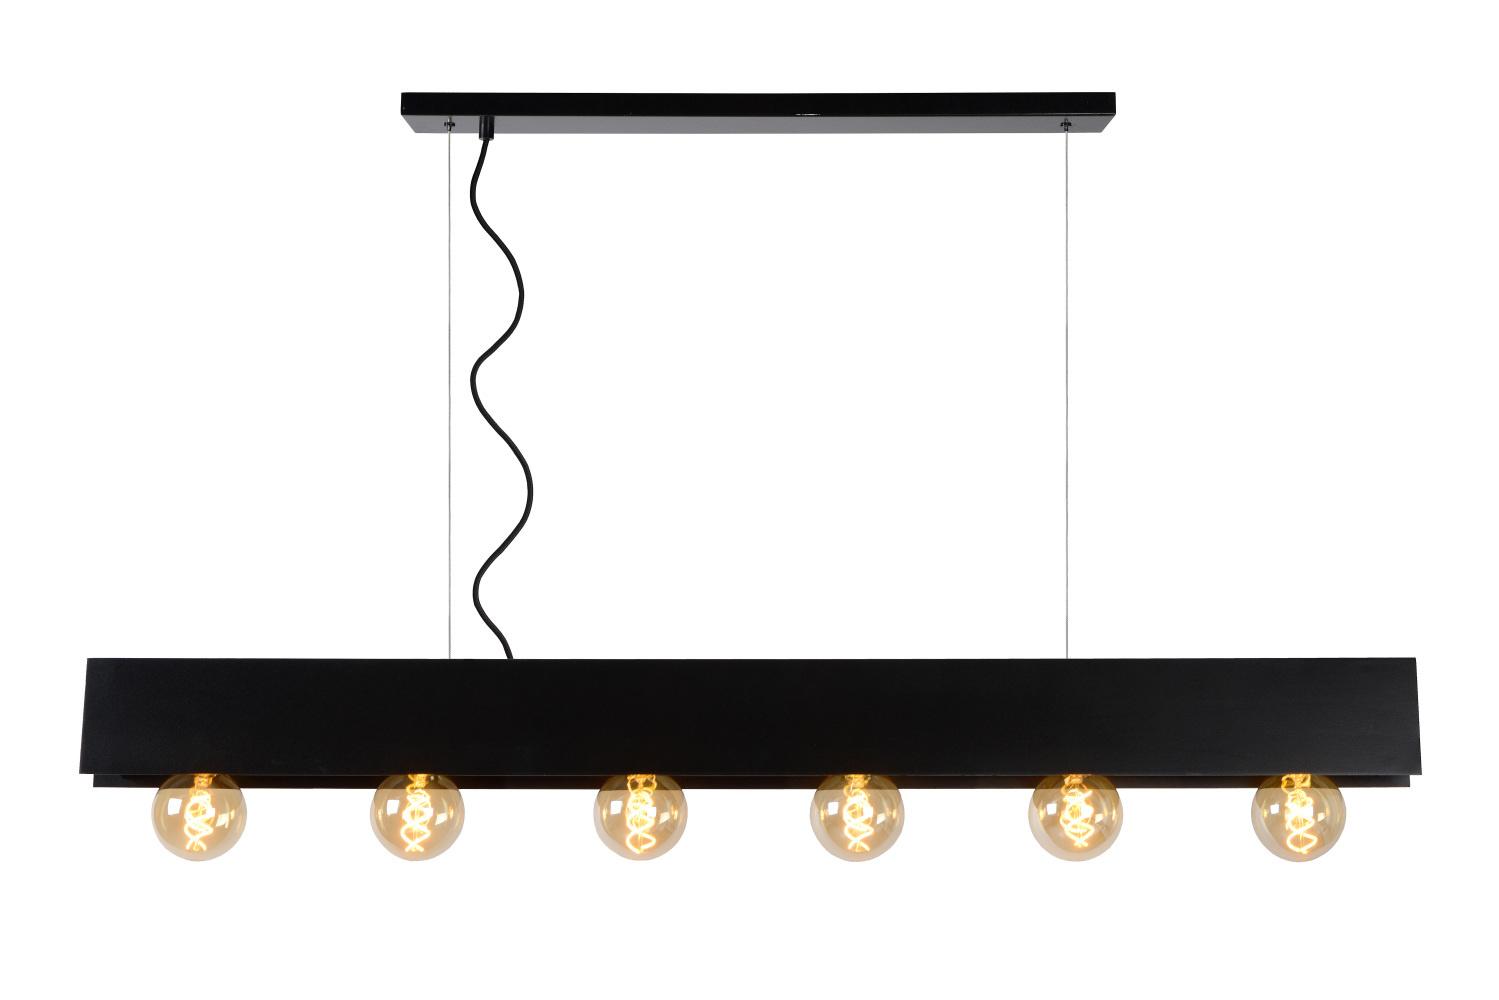 Lucide SURTUS Hanglamp 6xE27/60W Zwart